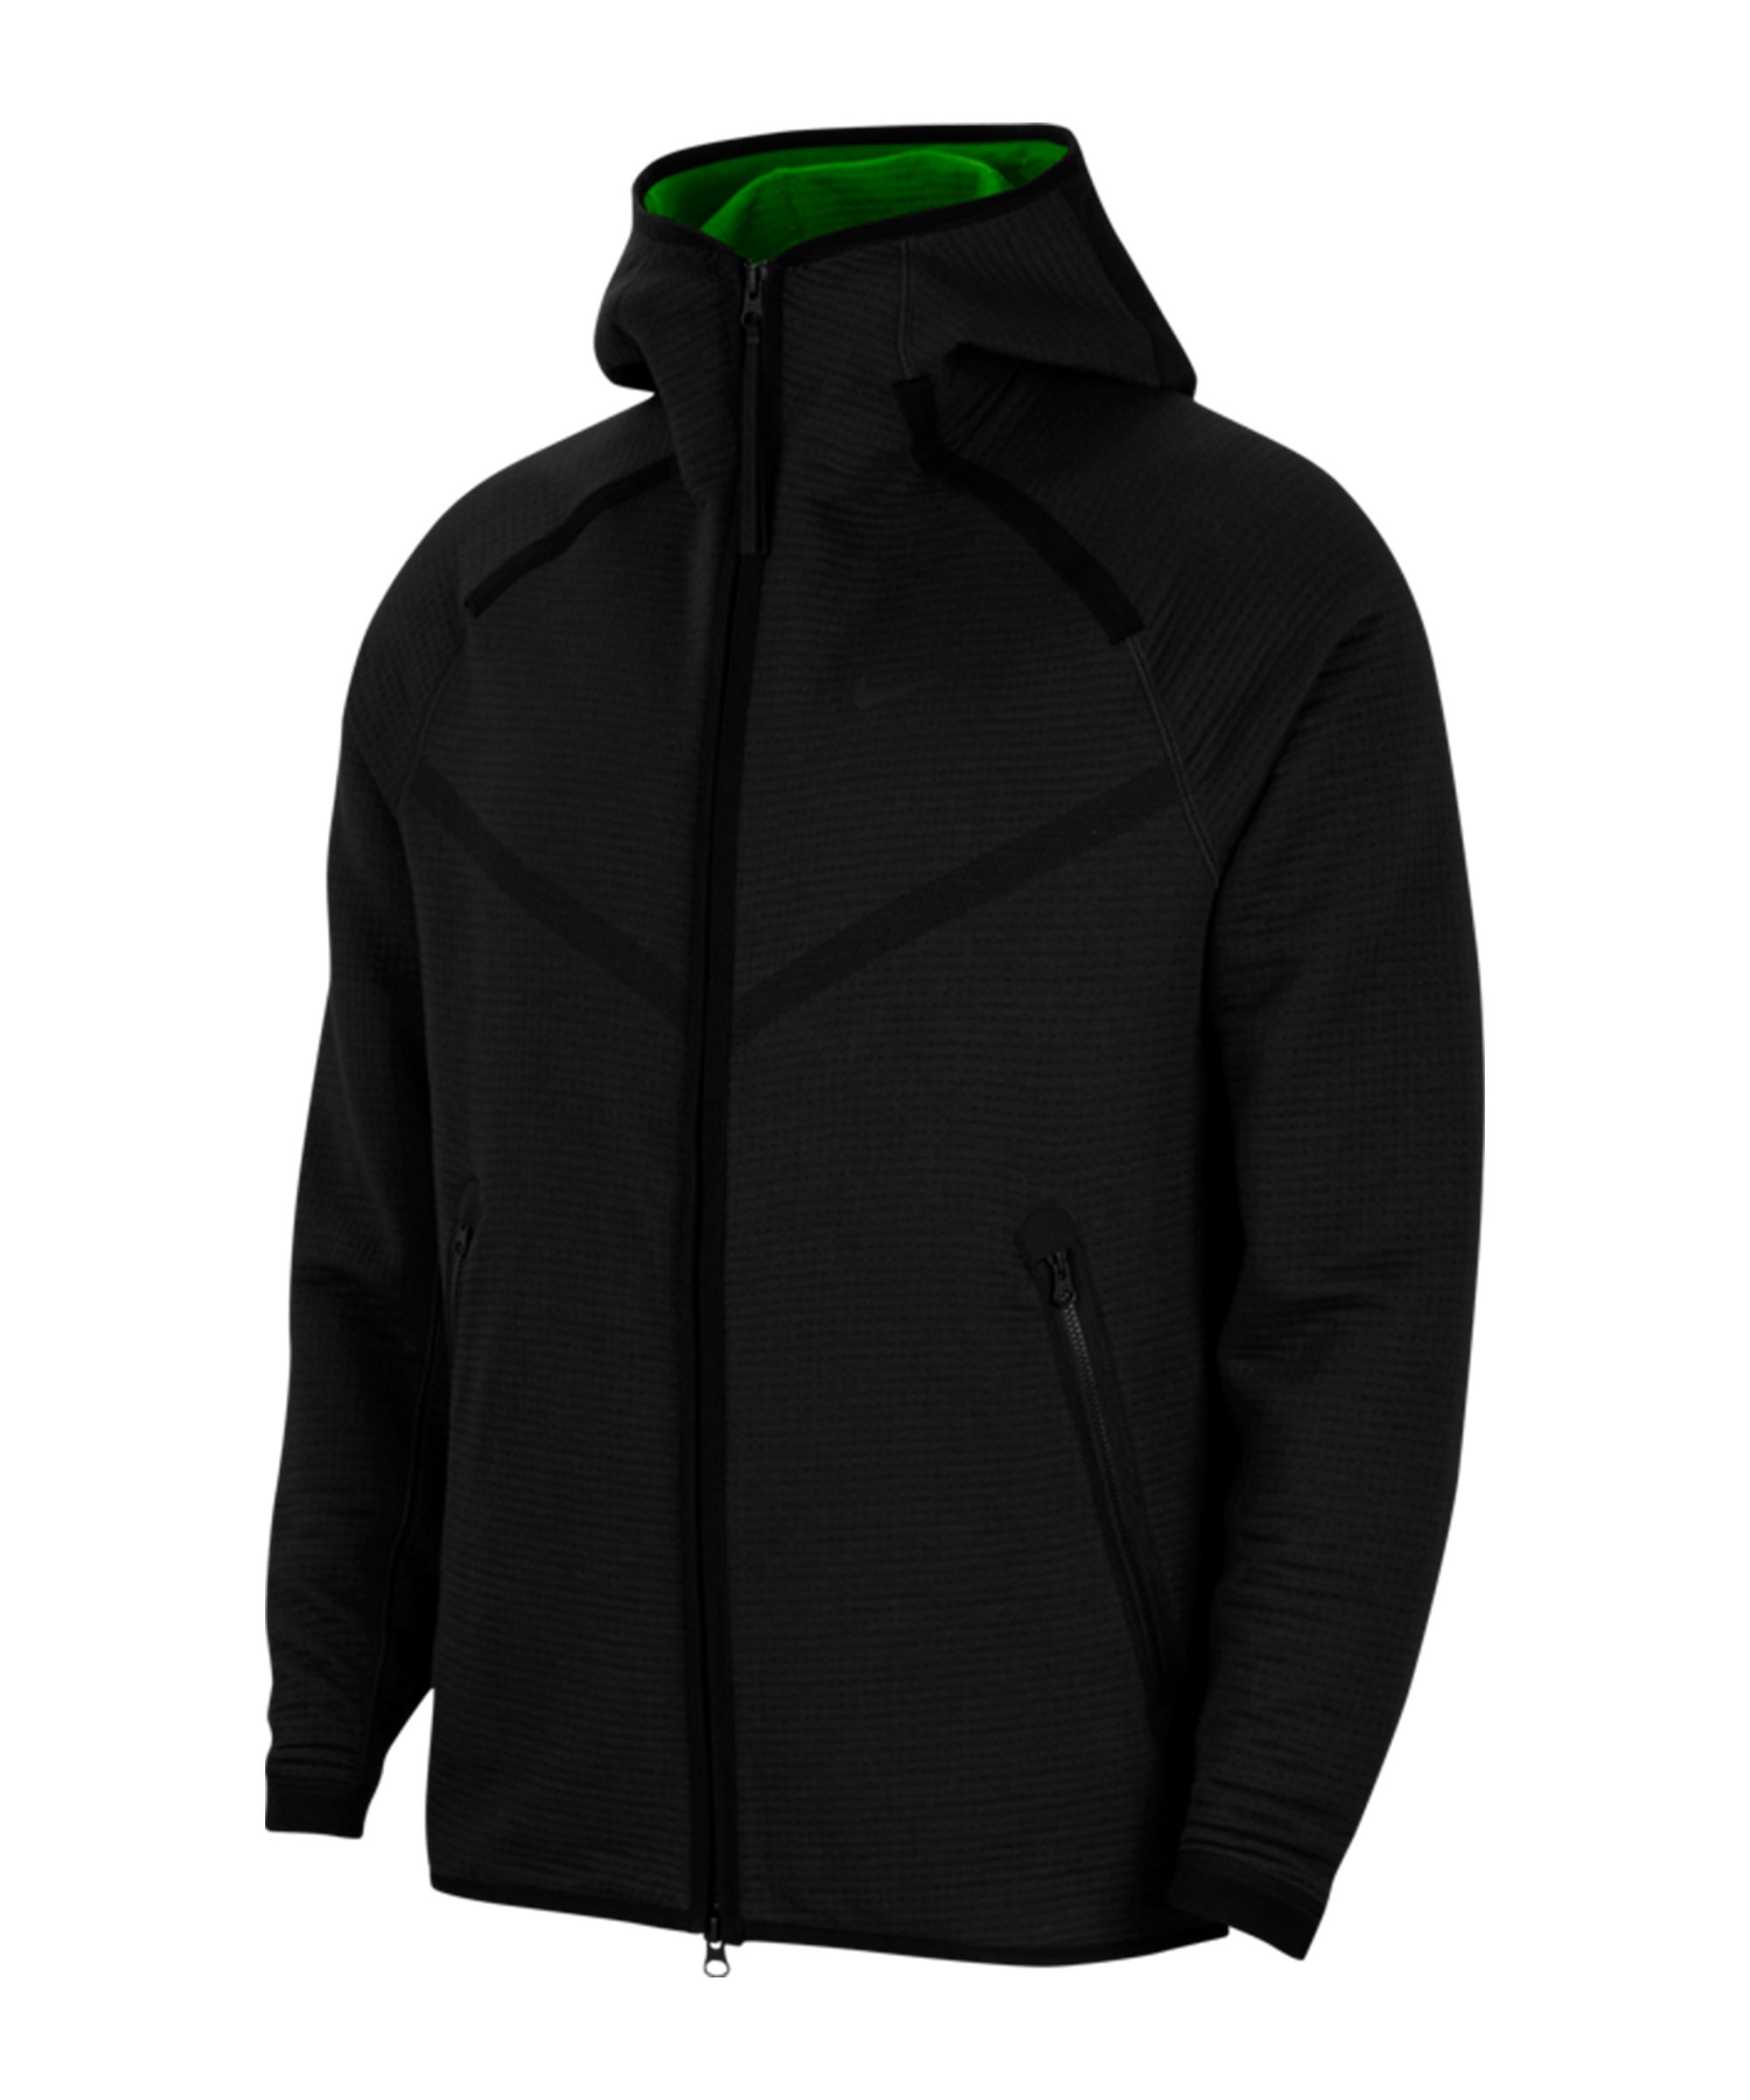 Nike Tech Pack Windrunner Schwarz Grün F014 - schwarz